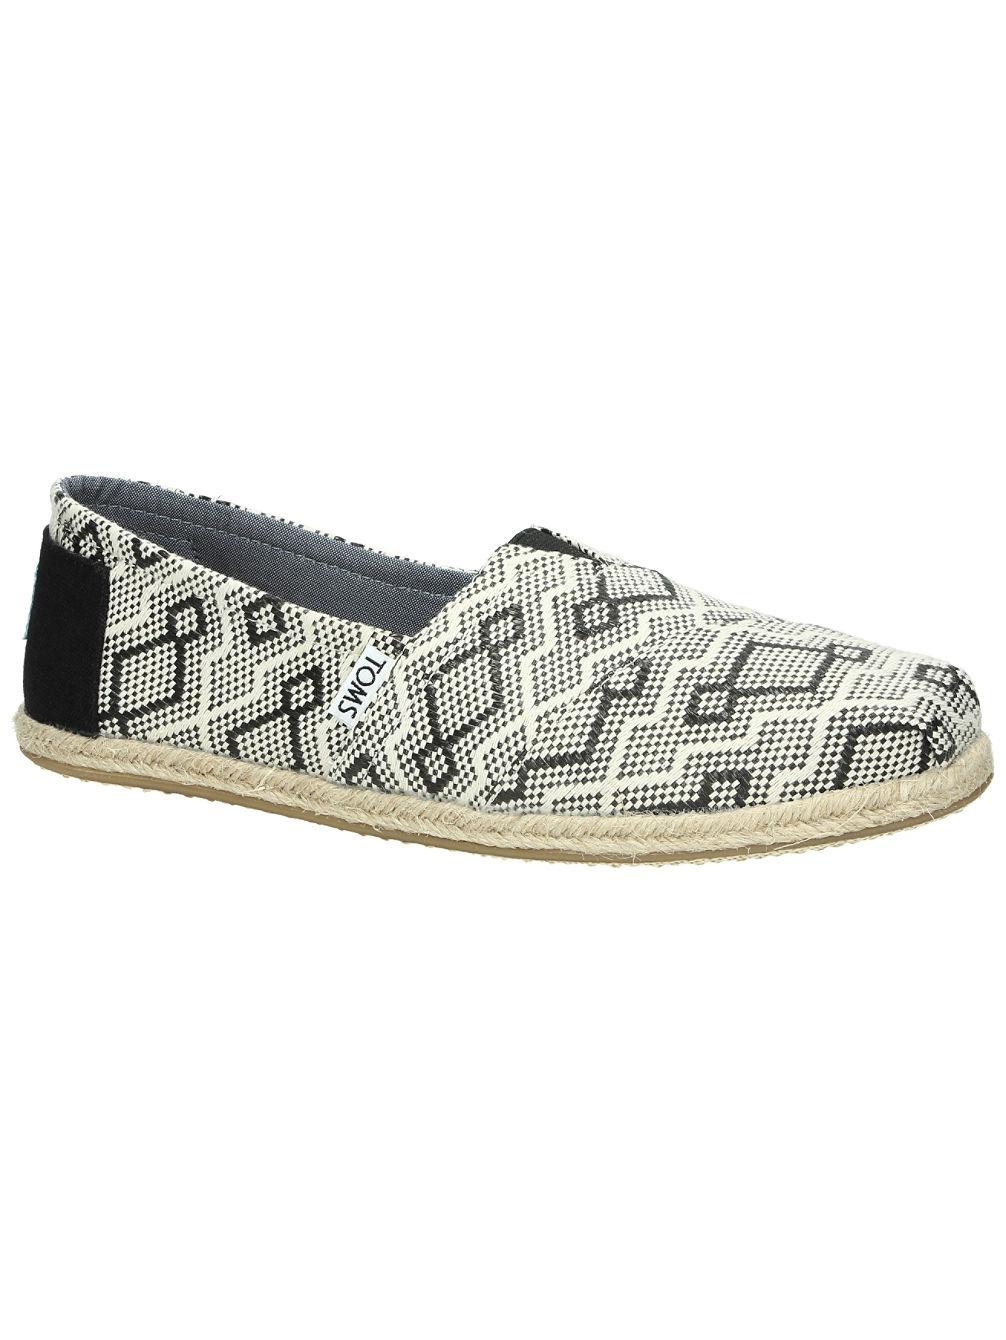 toms-seasonal-classics-slippers-women